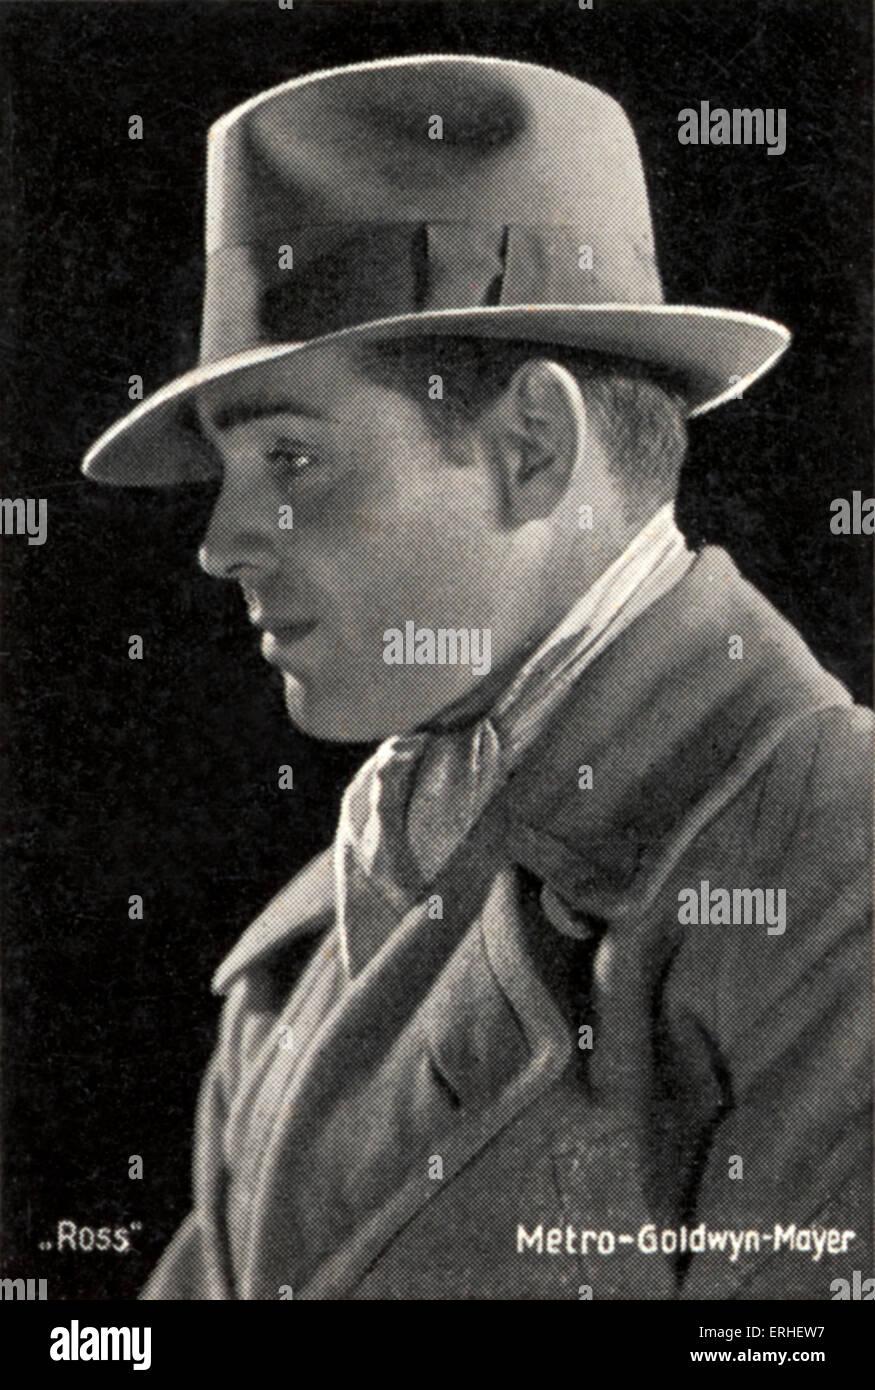 Clark Gable, portrait, wearing hat. American film actor 2 February 1901 - 16 November 1960 - Stock Image